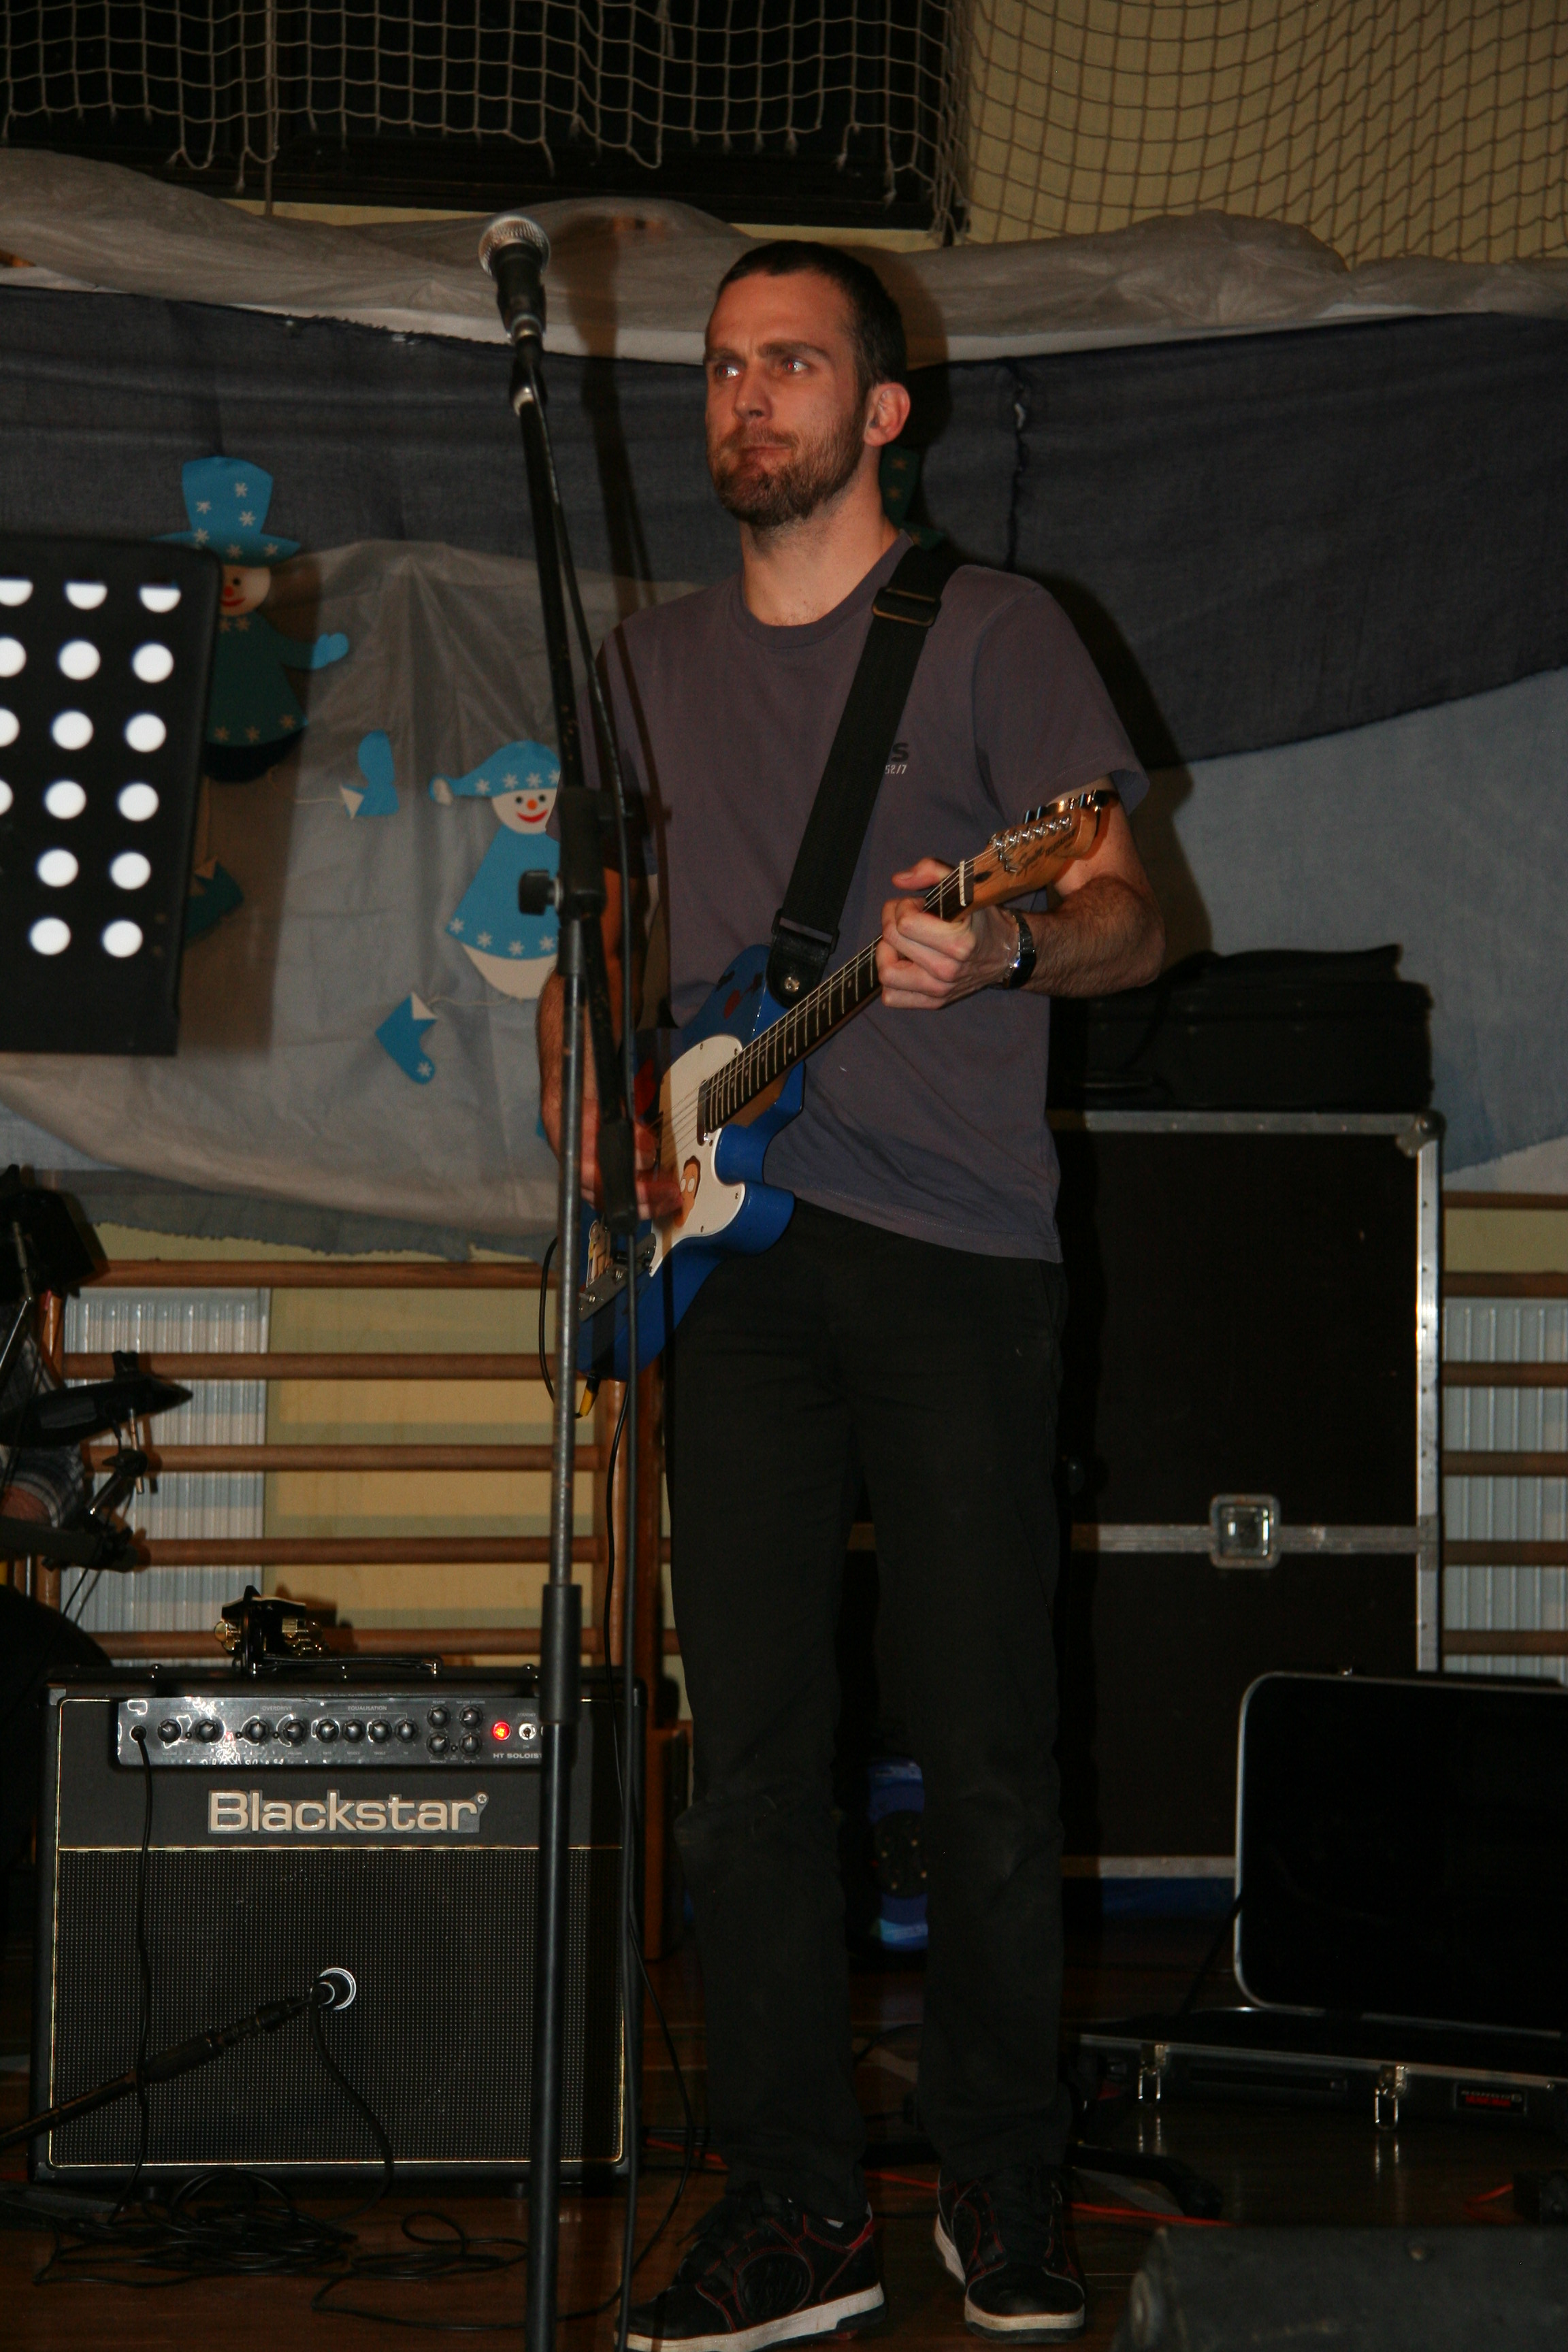 novoletno_humanitarni-koncert-2019-211